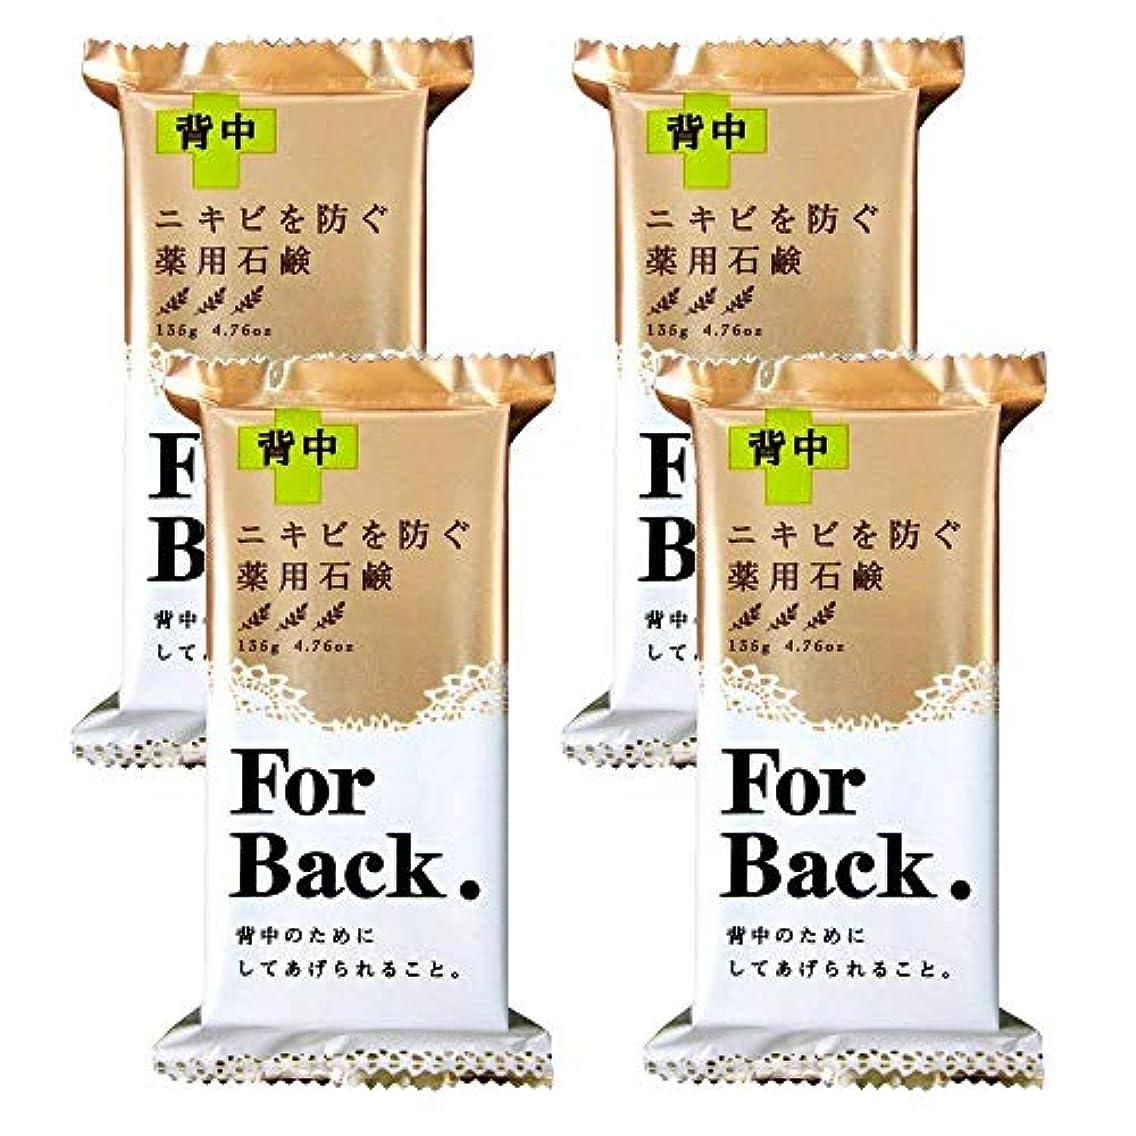 経験的治世伝記薬用石鹸 ForBack 135g×4個セット